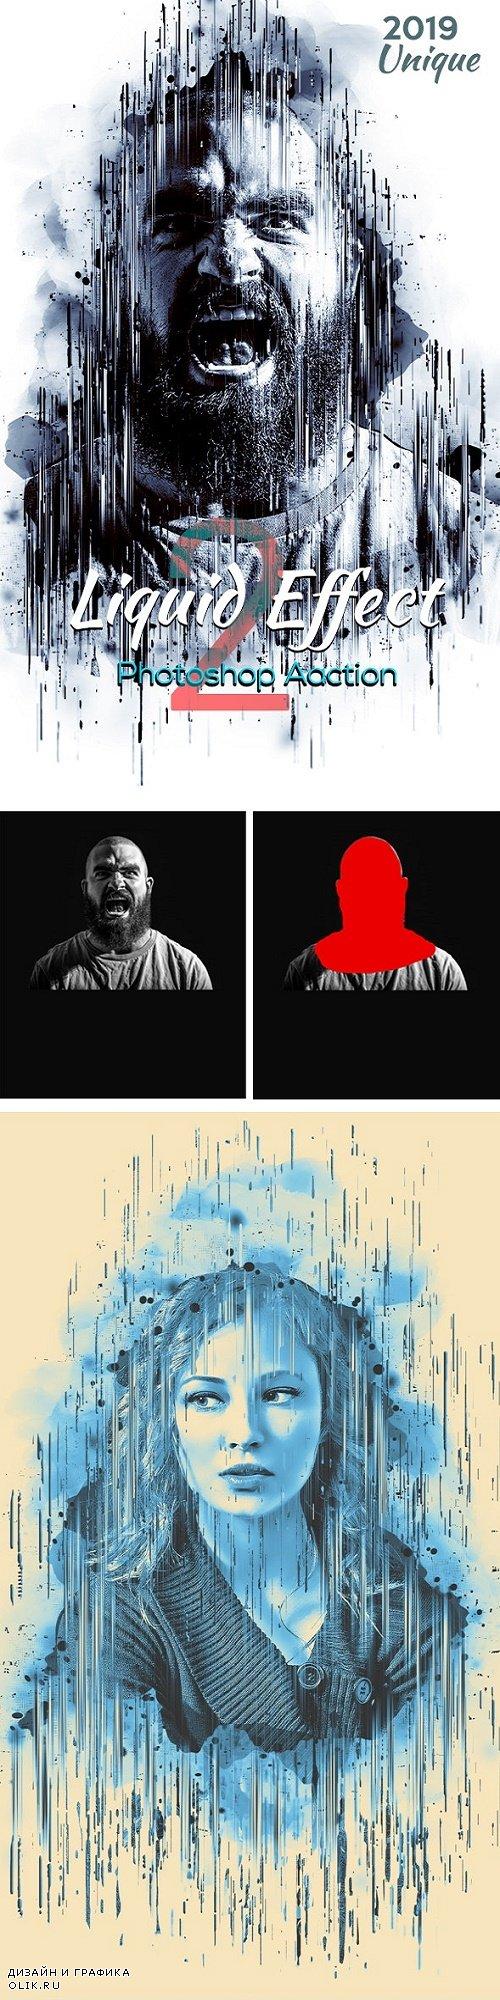 Liquid Effect Photoshop Action 2 24470006